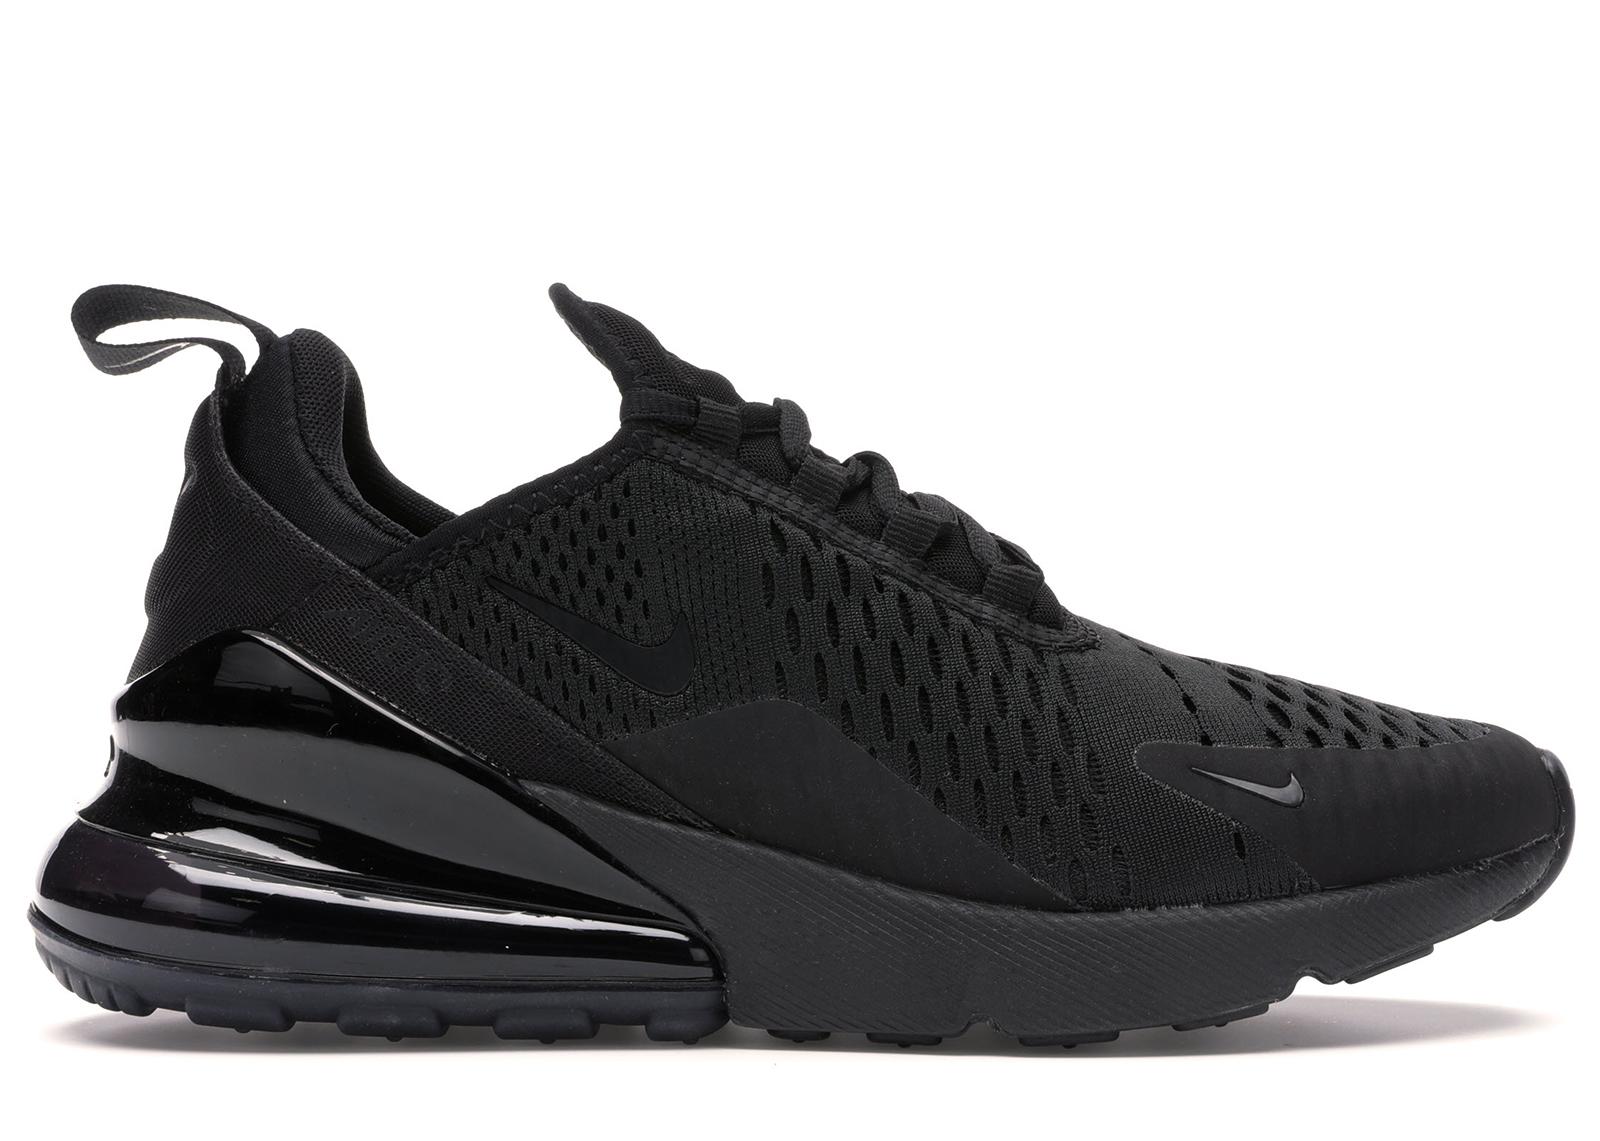 Buy Nike Air Max 270 Shoes \u0026 Deadstock